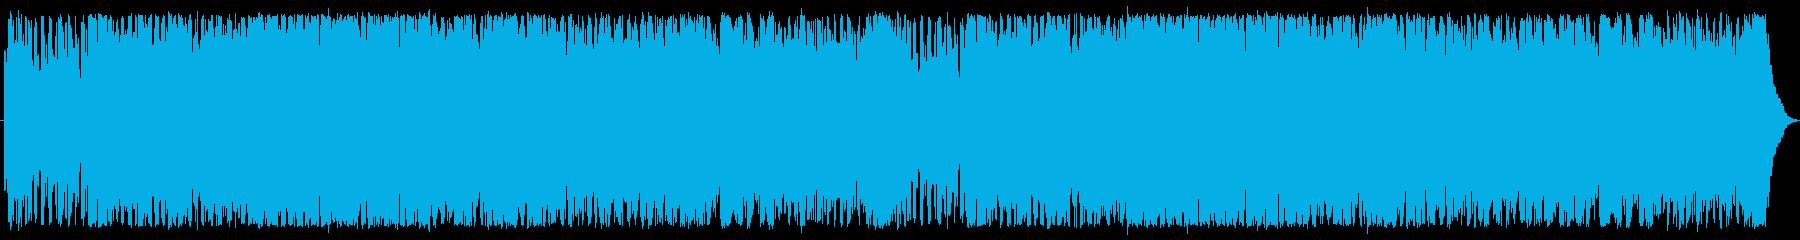 RPGの戦闘曲の再生済みの波形